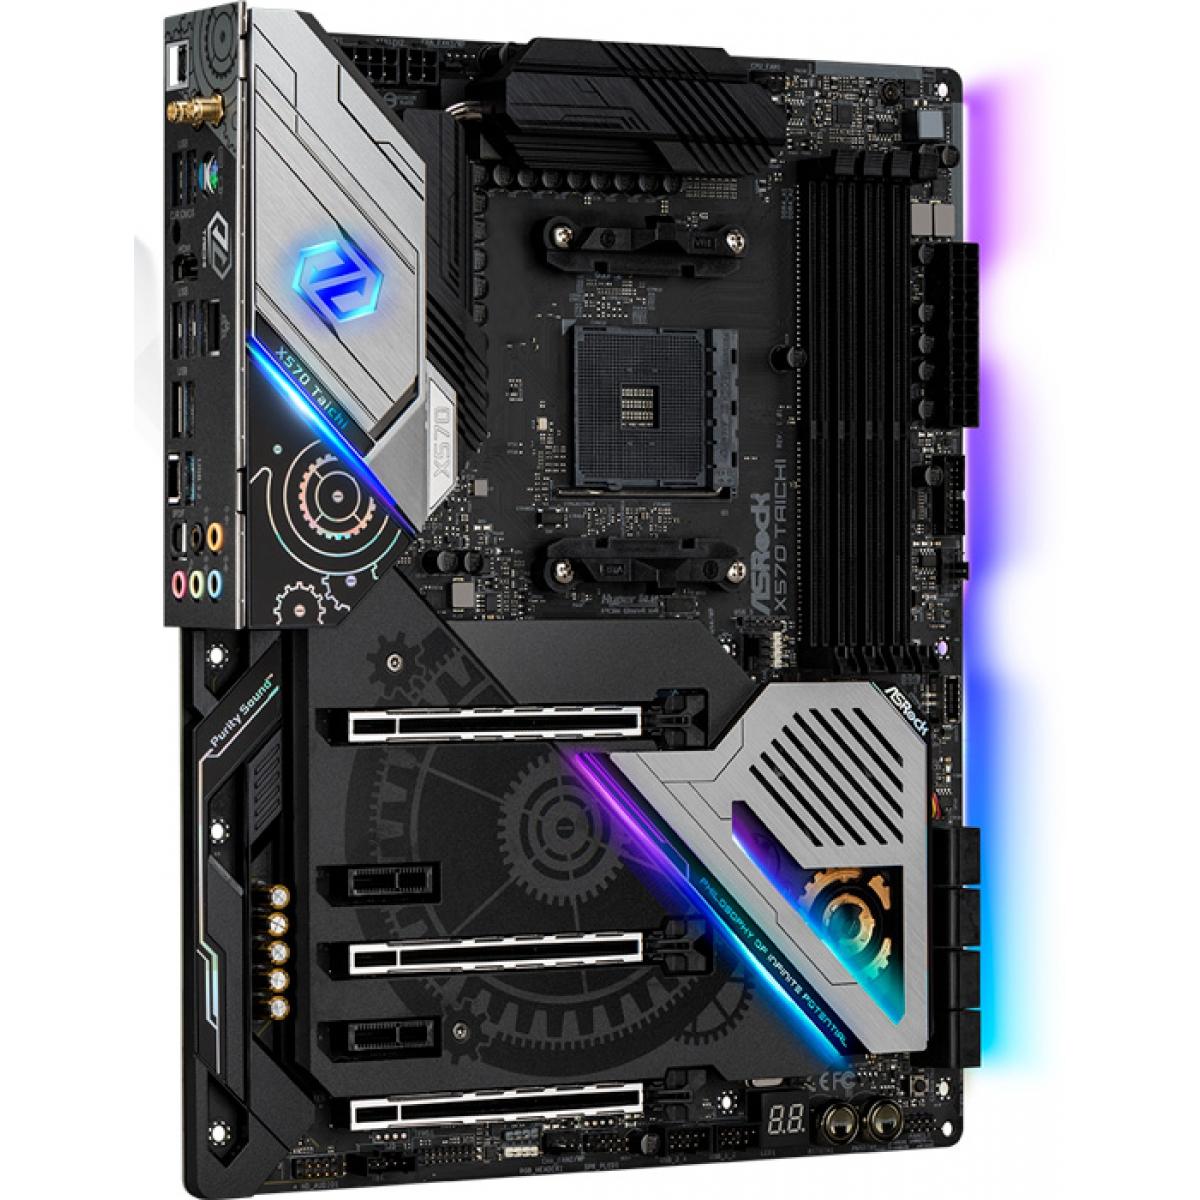 Placa Mãe ASRock X570 Taichi Wifi, Chipset X570, AMD AM4, ATX, DDR4